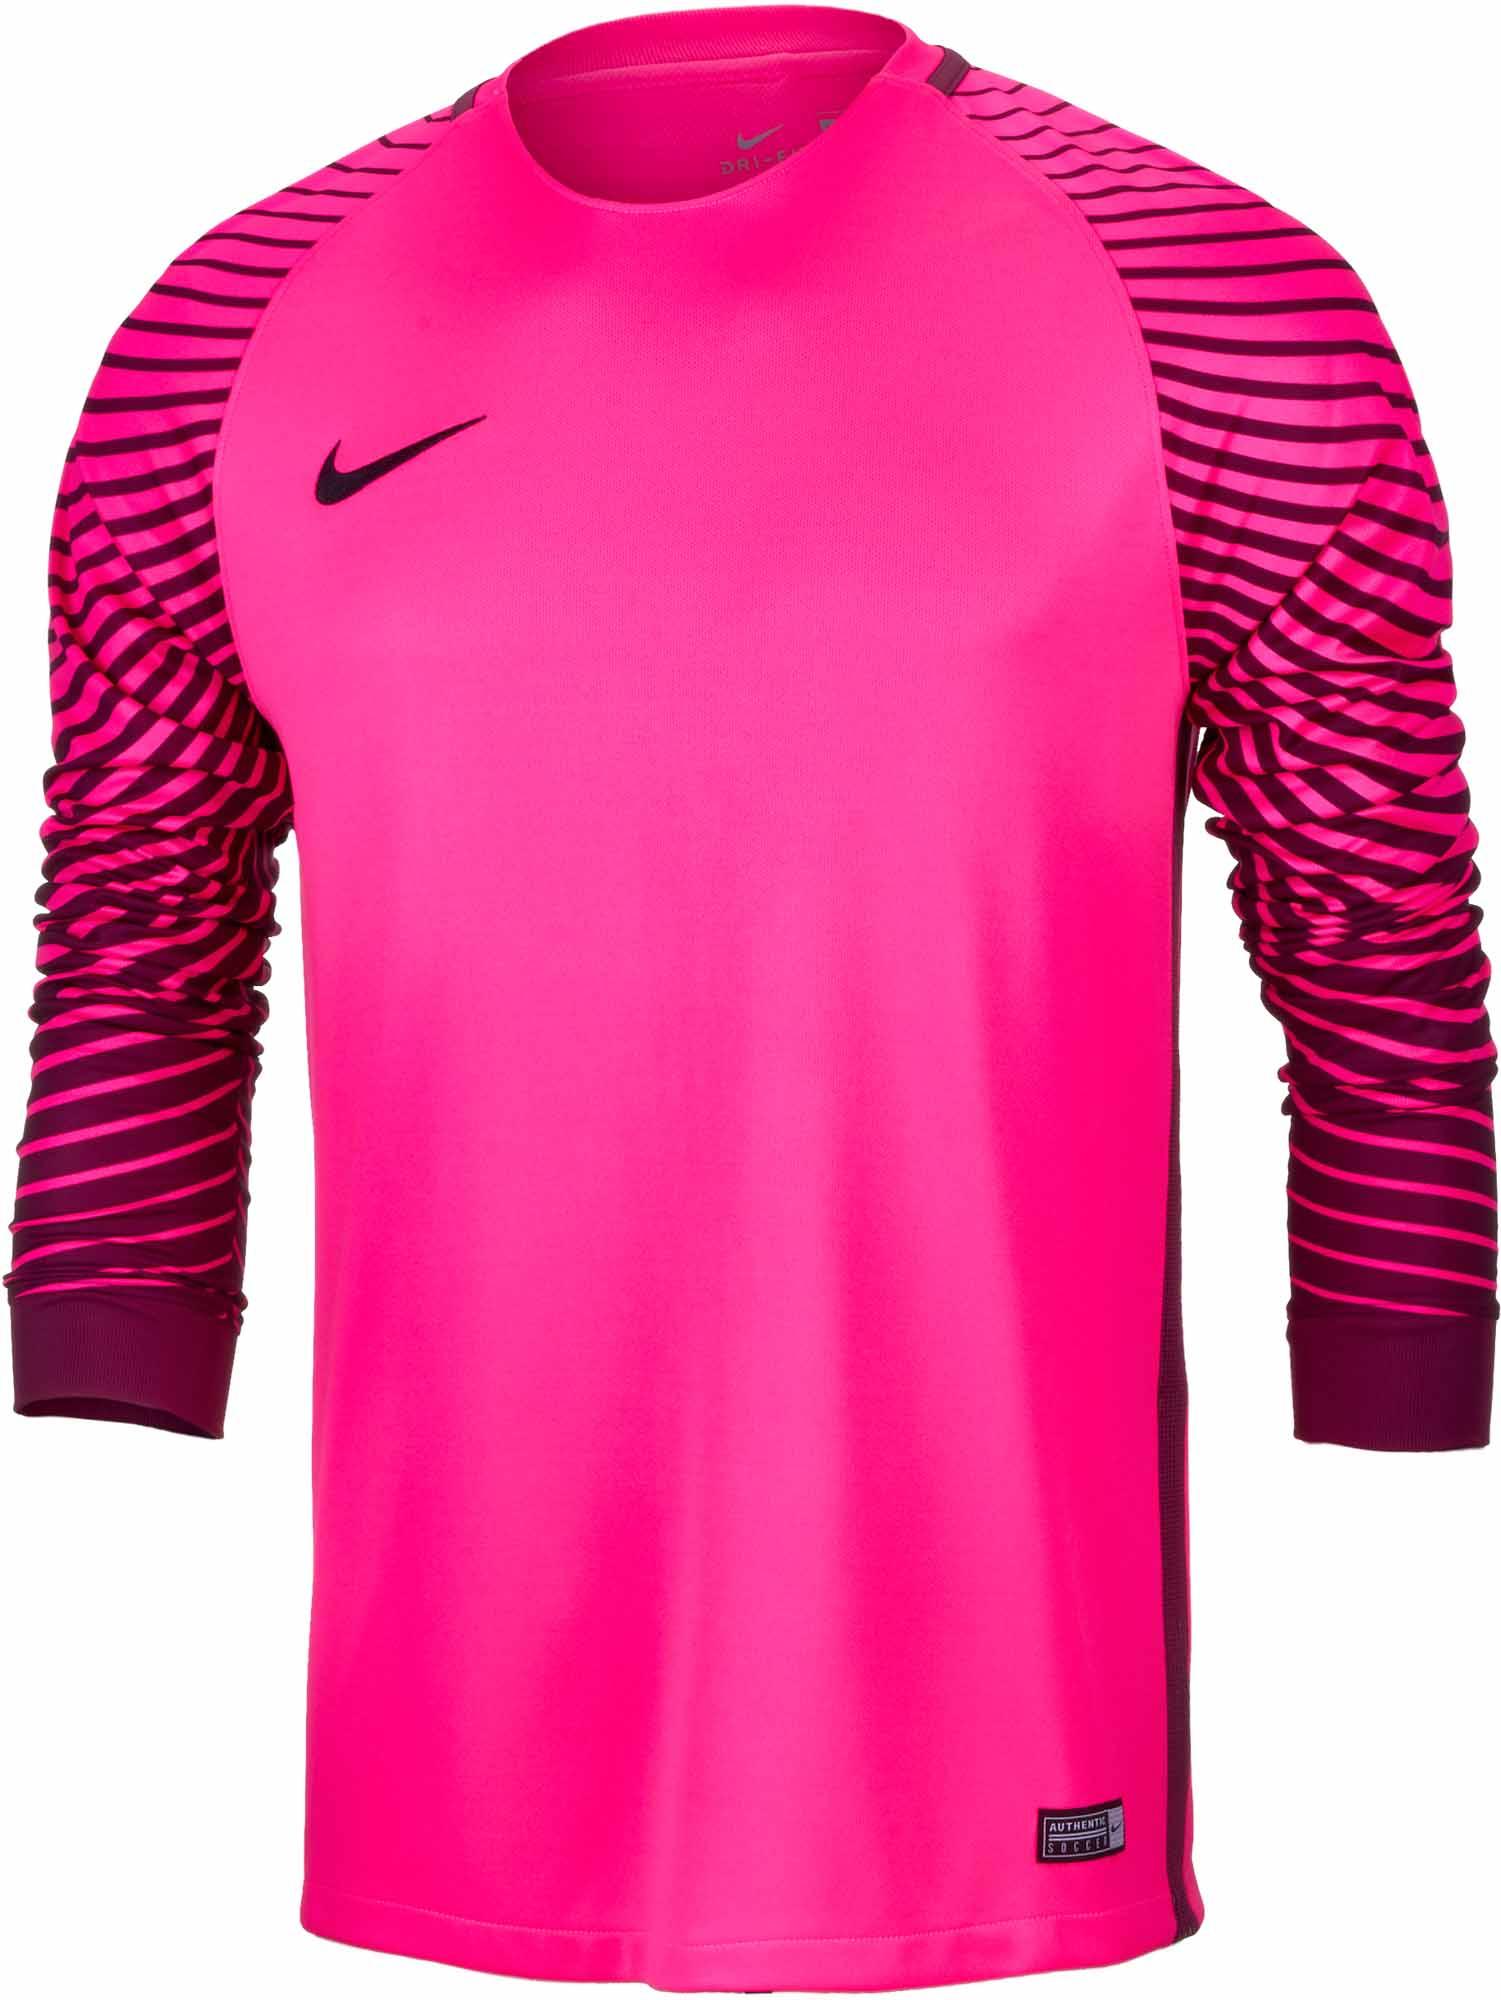 Nike Gardien Goalkeeper Jersey – Hyper Pink Villain Red 0c302ce83